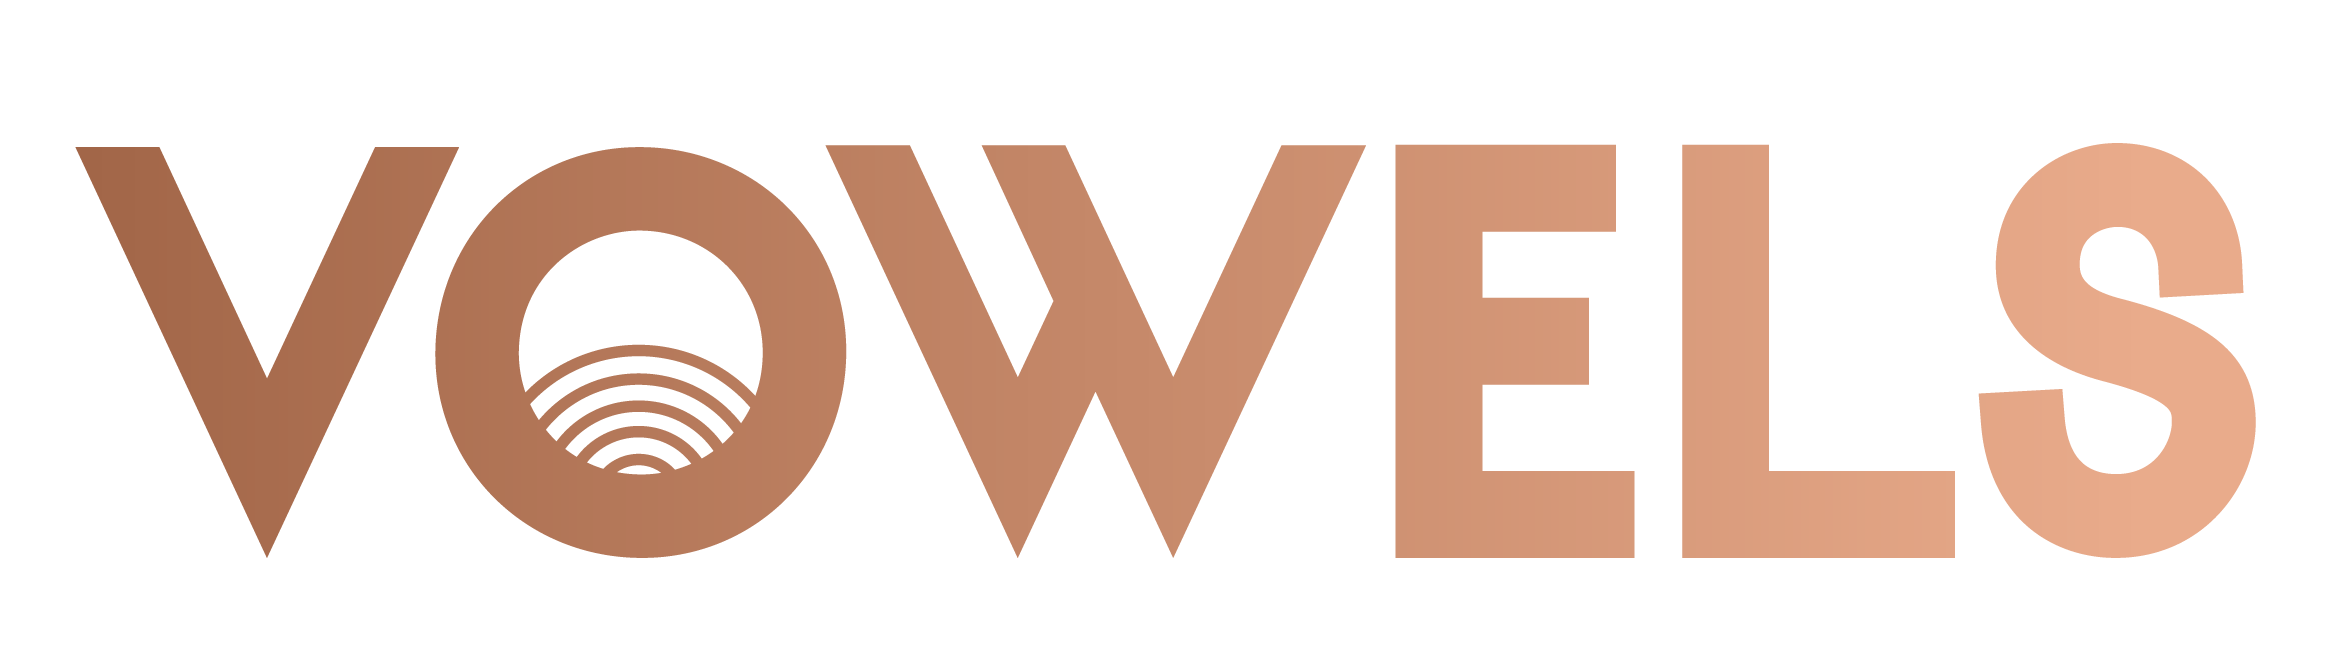 Vowels Branding Agency logo